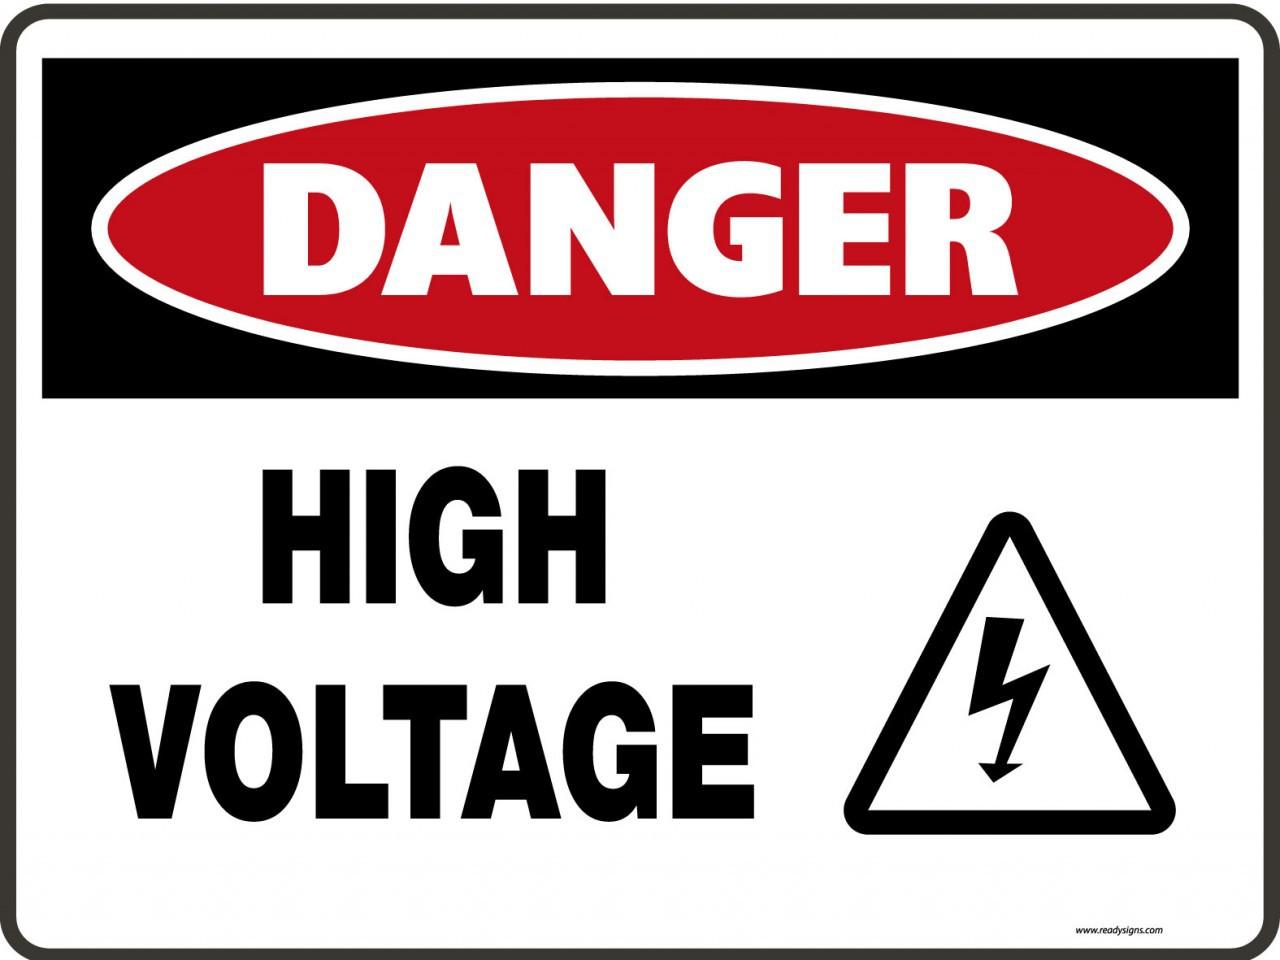 High Voltage Safety Training : Høyspentkurs safe operation of high voltage power system